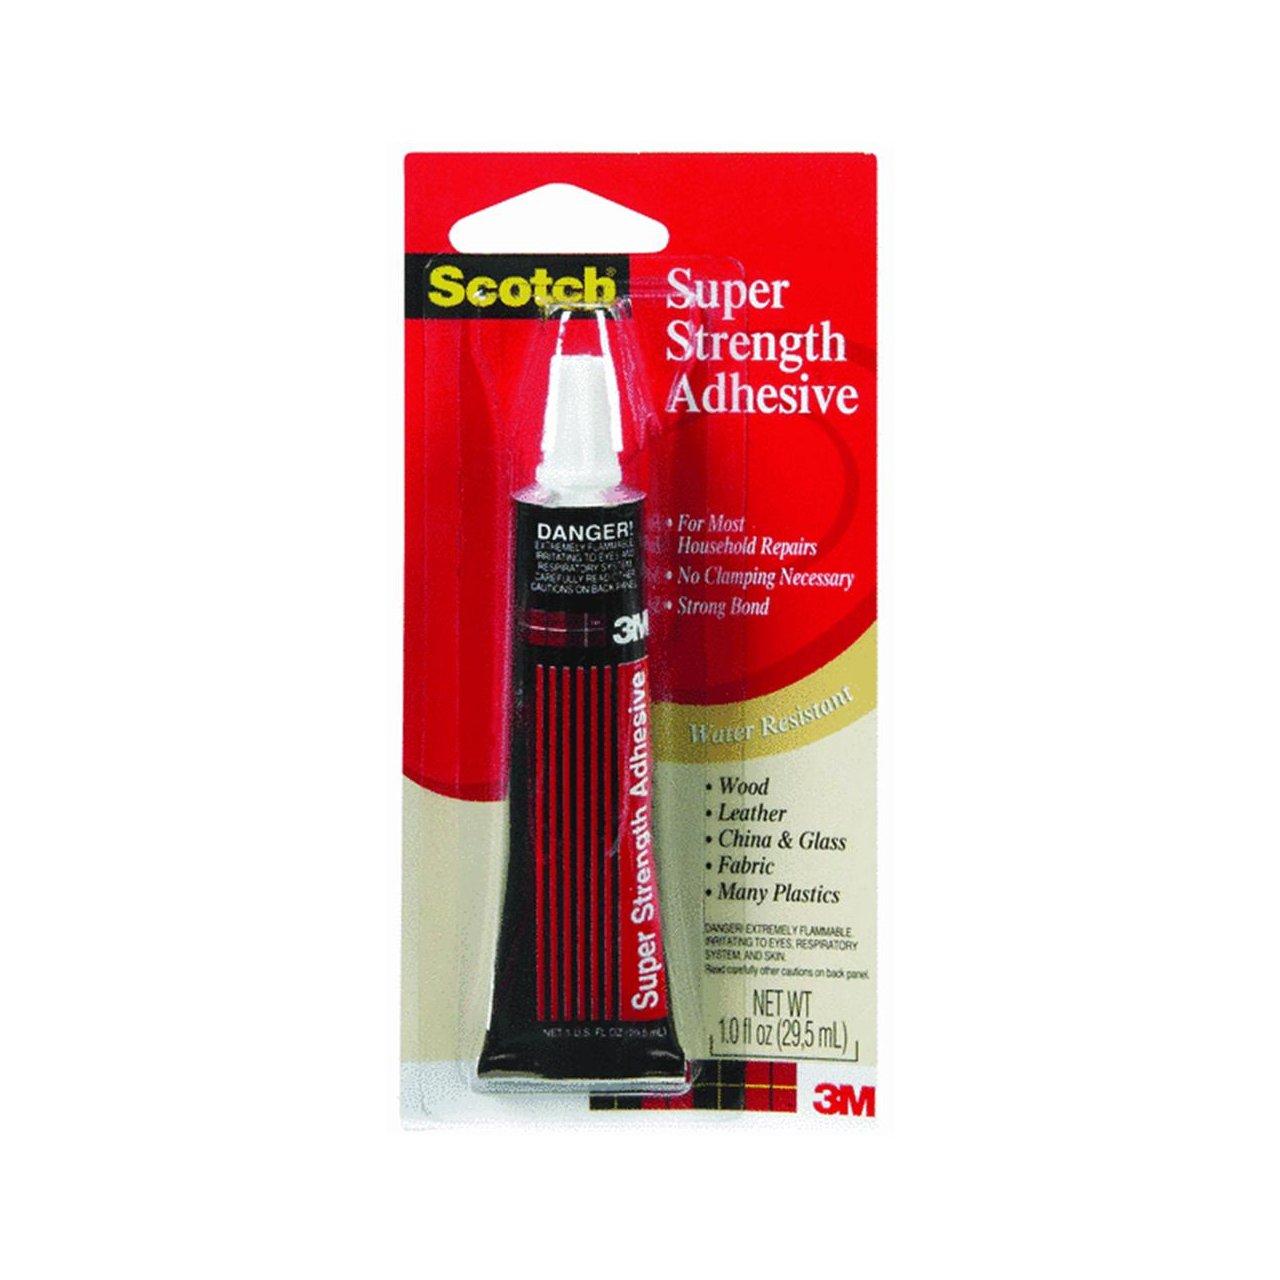 3M Scotch 6004 Super Strength Adhesive, 1 oz Tube